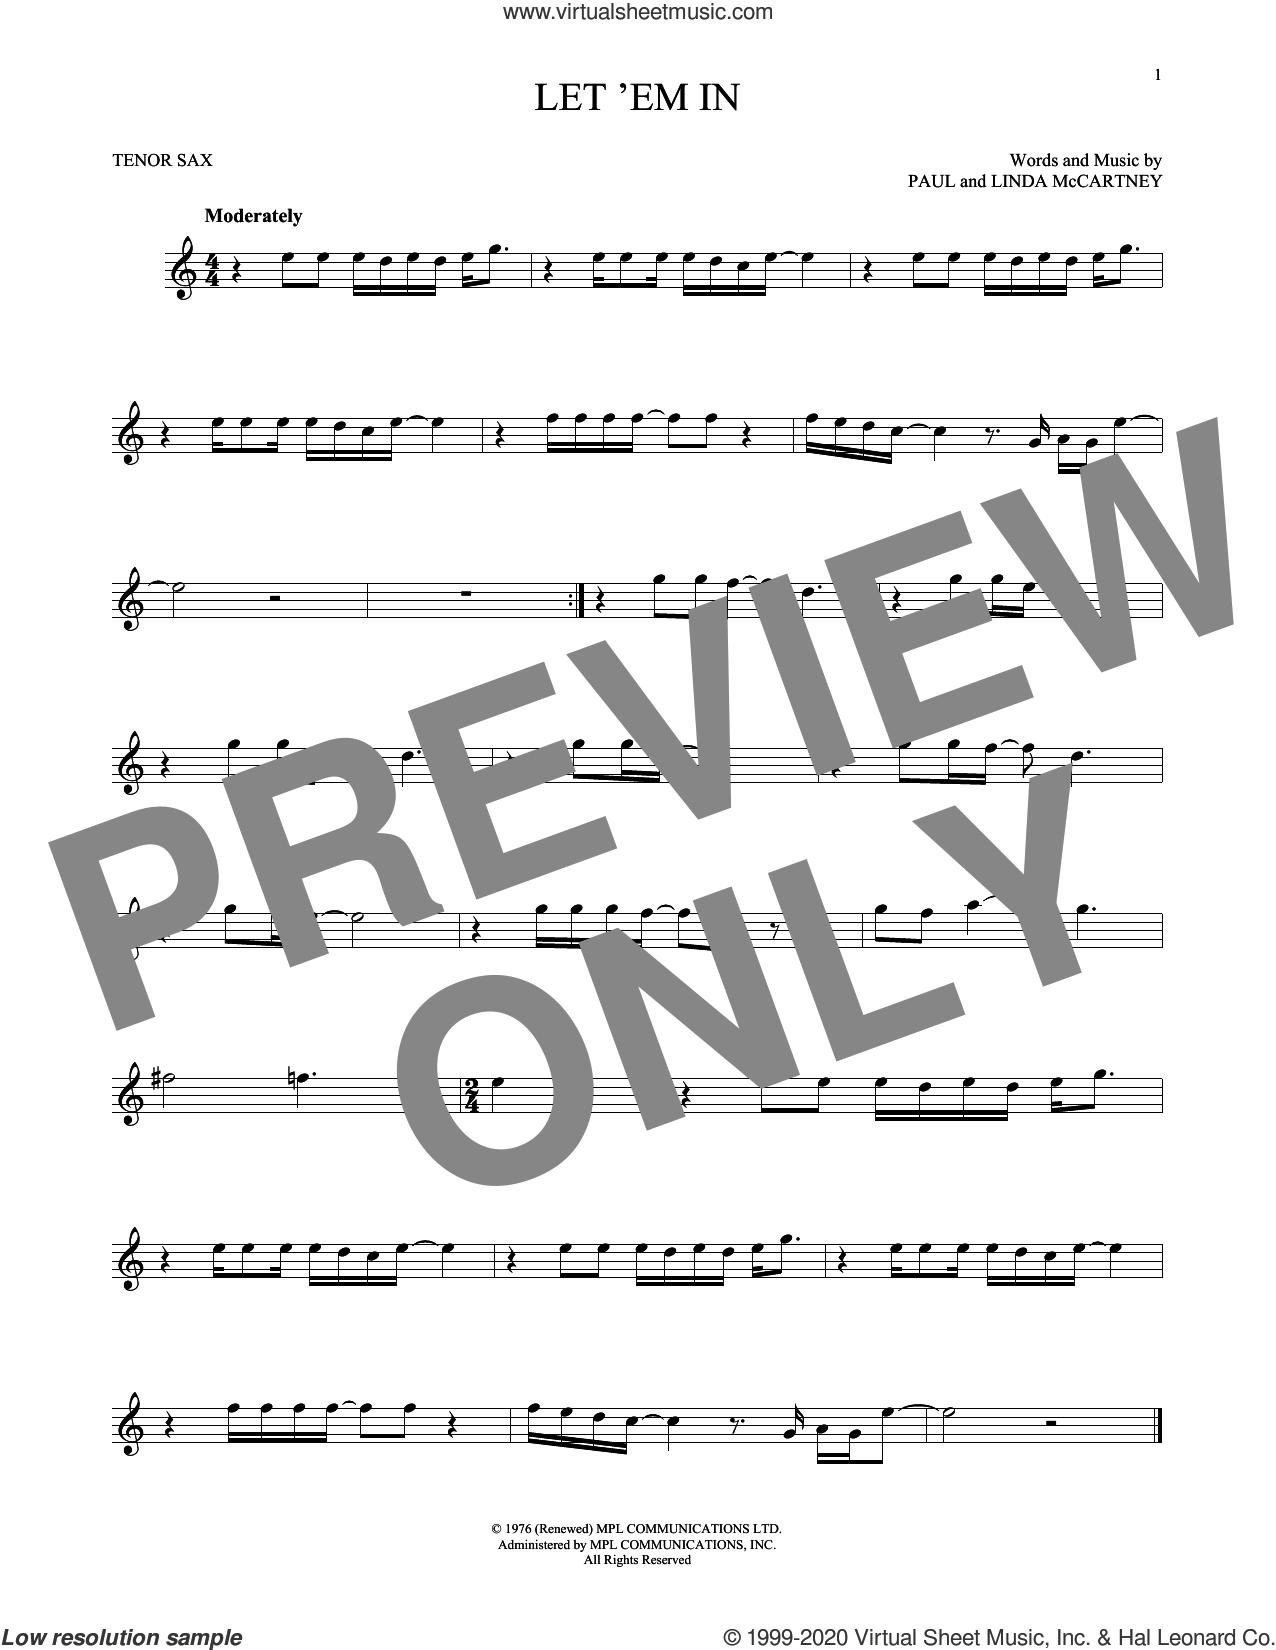 Let 'Em In sheet music for tenor saxophone solo by Wings, Linda McCartney and Paul McCartney, intermediate skill level